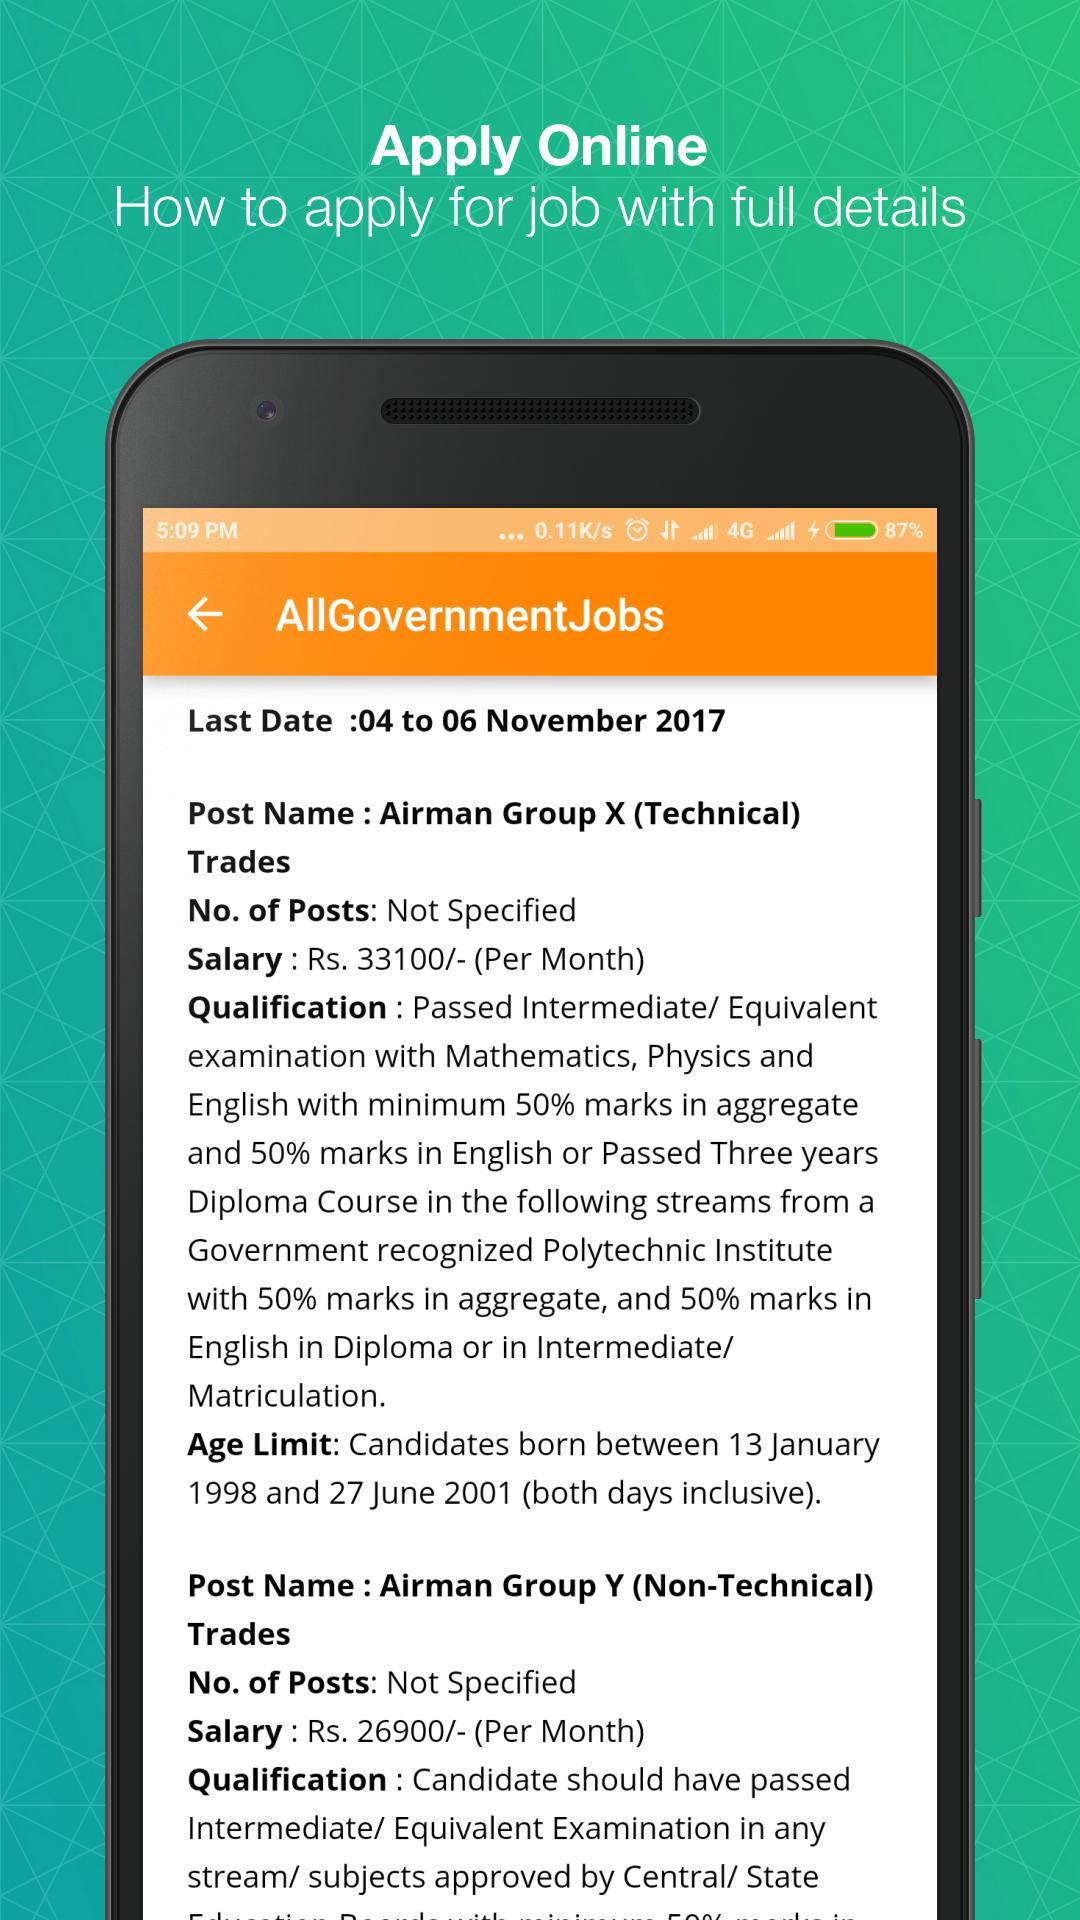 App St Iphone Screensh Naukri – Lylc